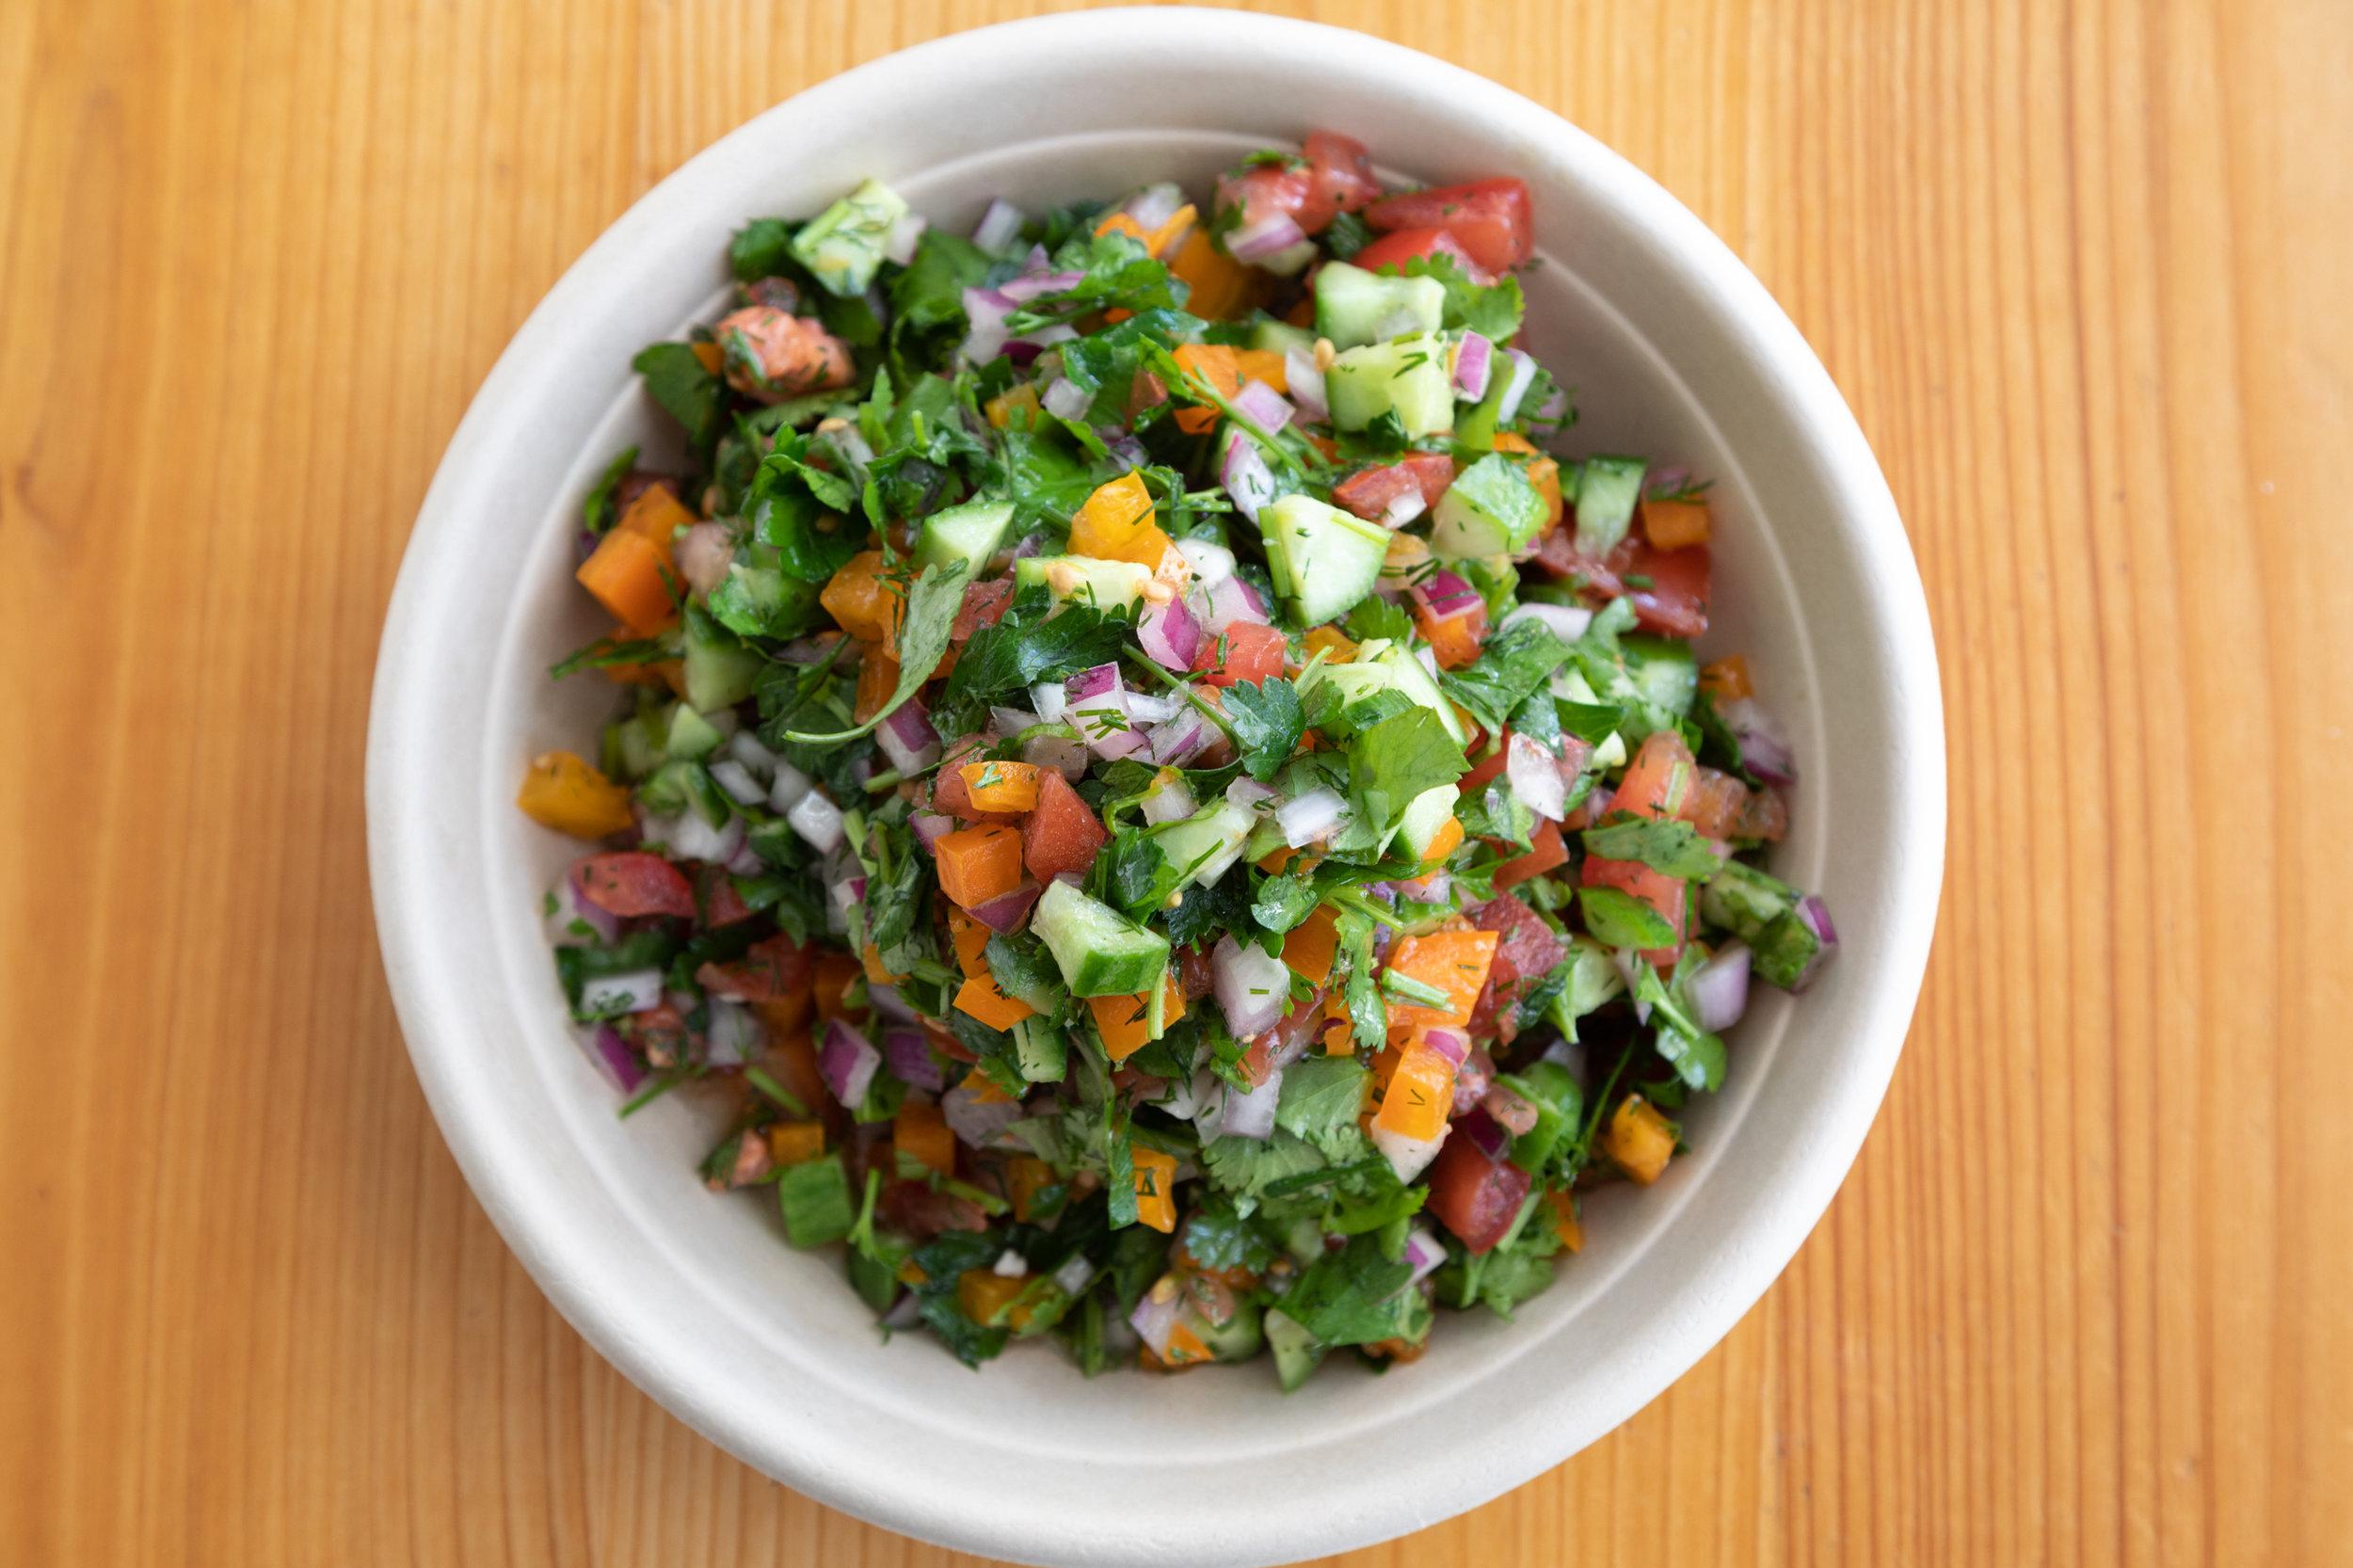 Spread-Isreali Salad.jpg